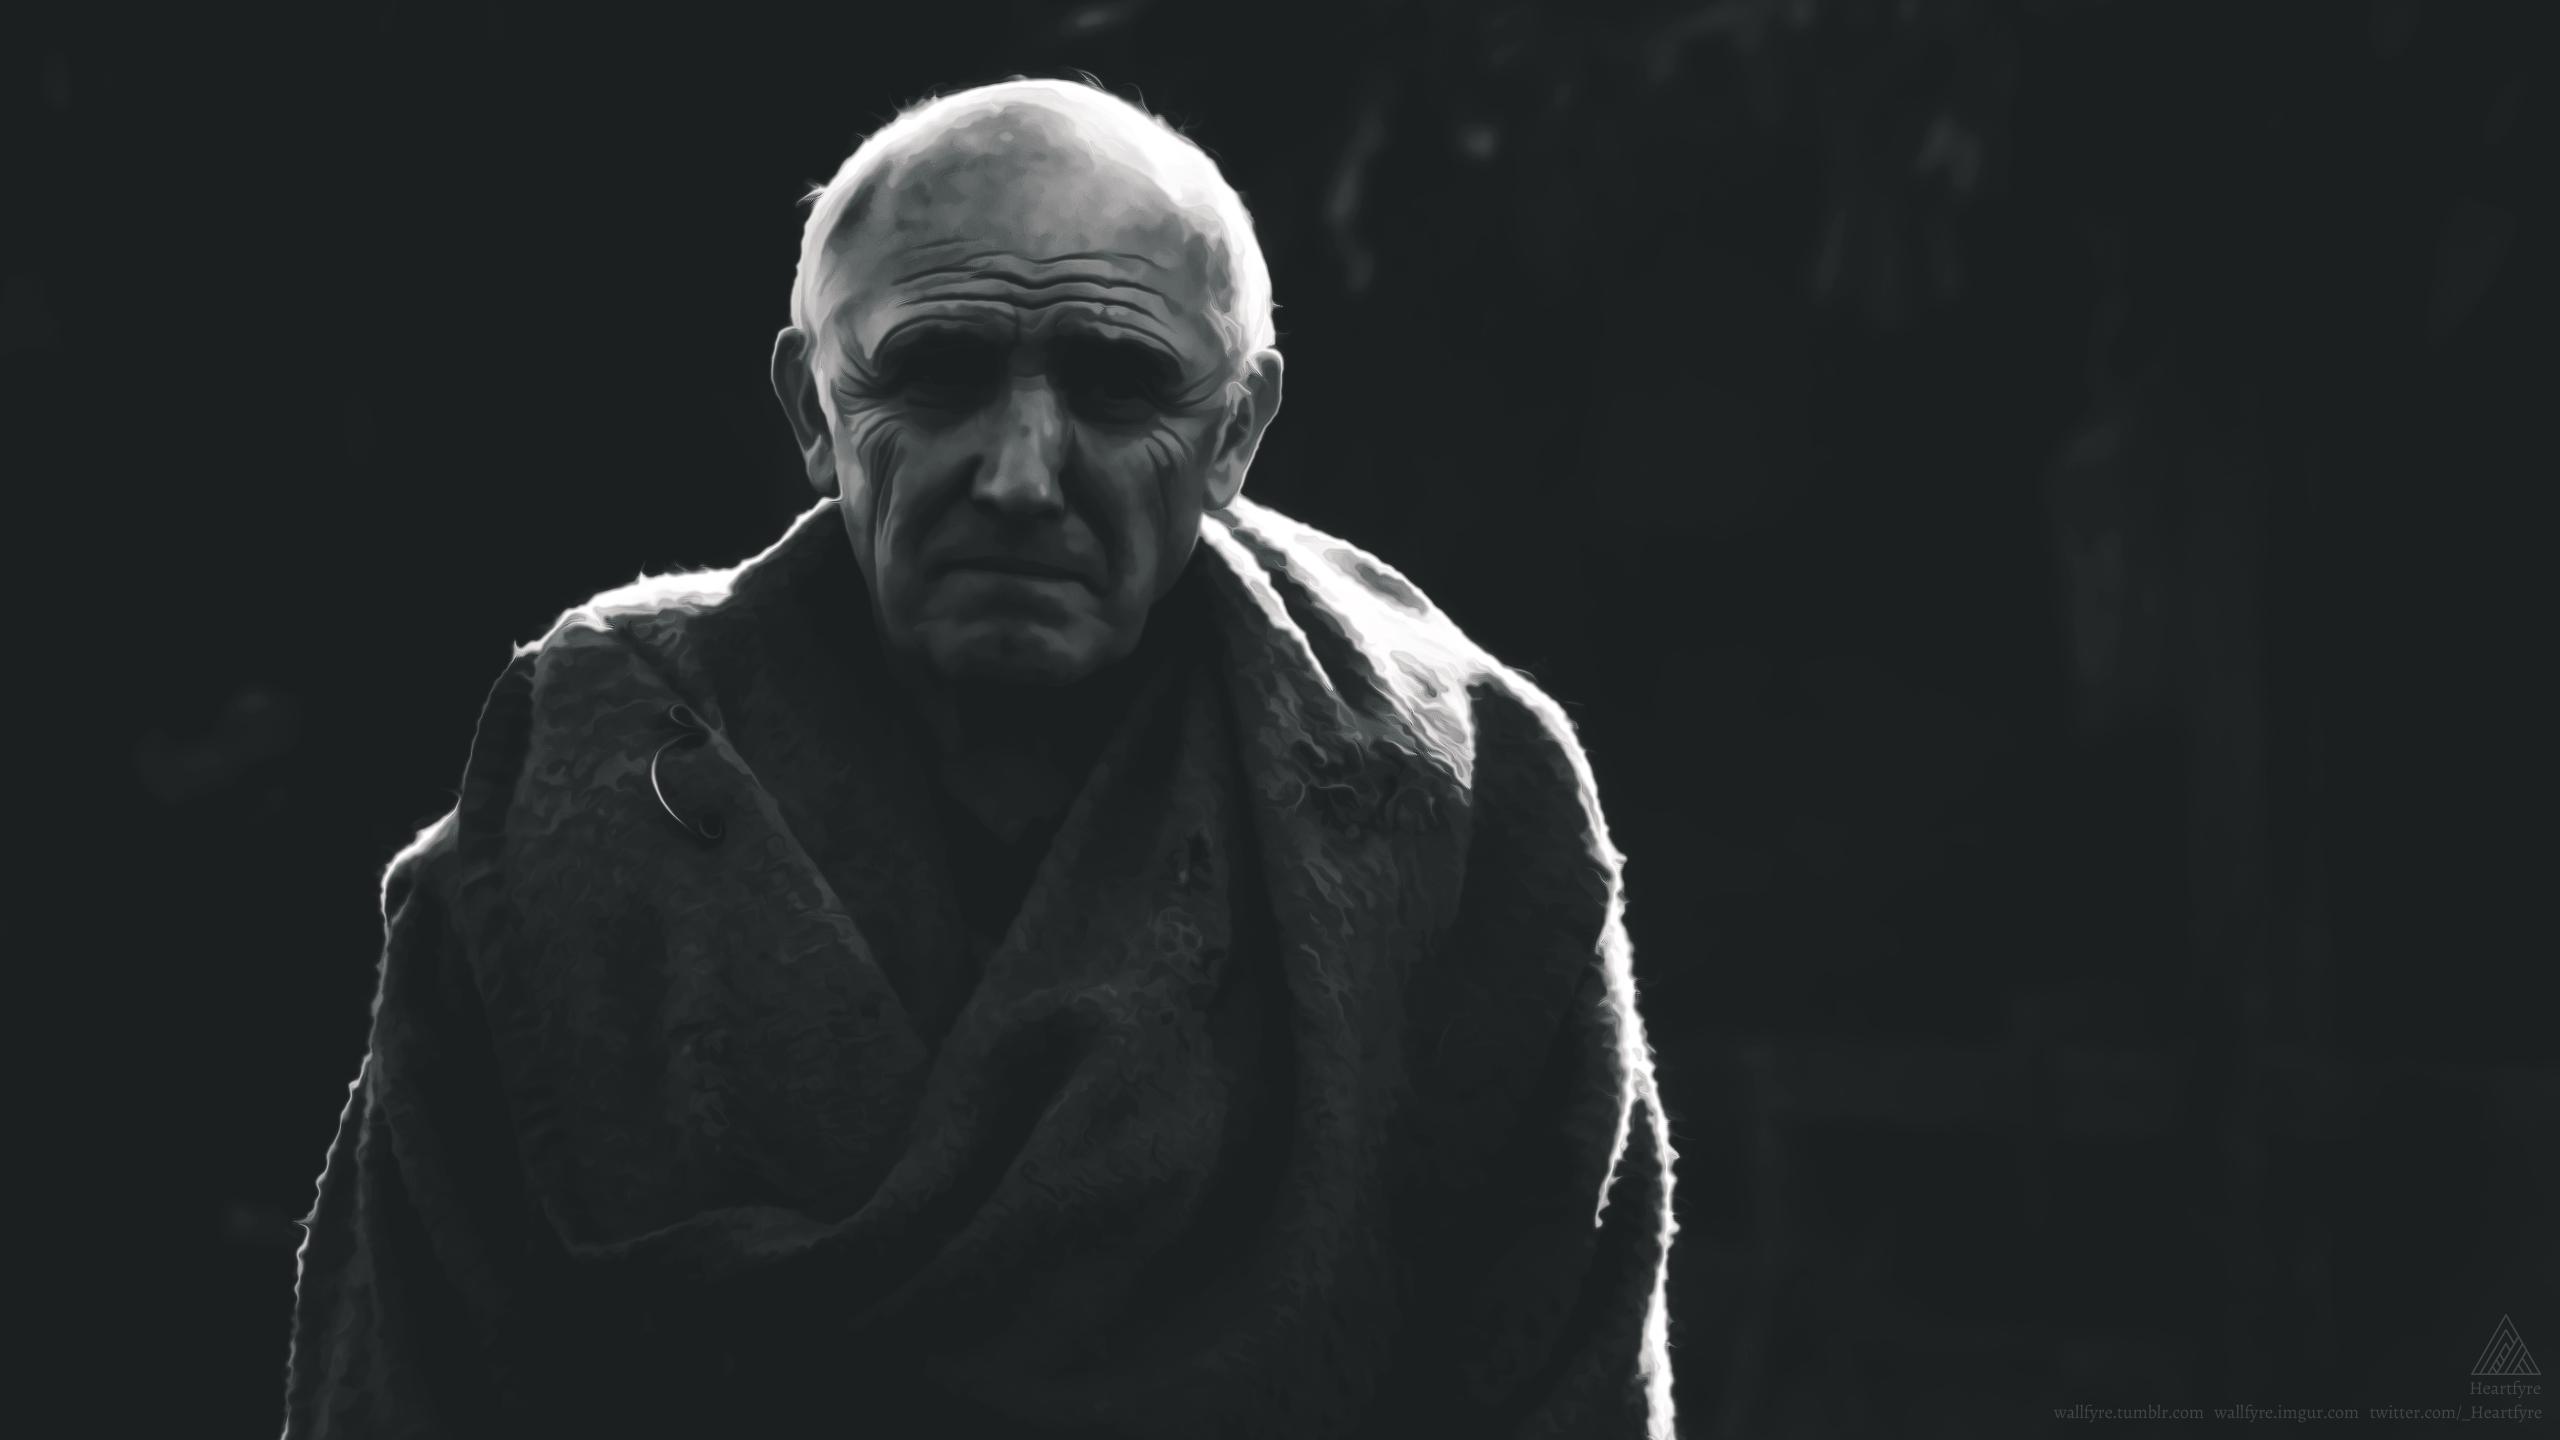 Wallpaper : Game of Thrones, HBO, tv series, George R R